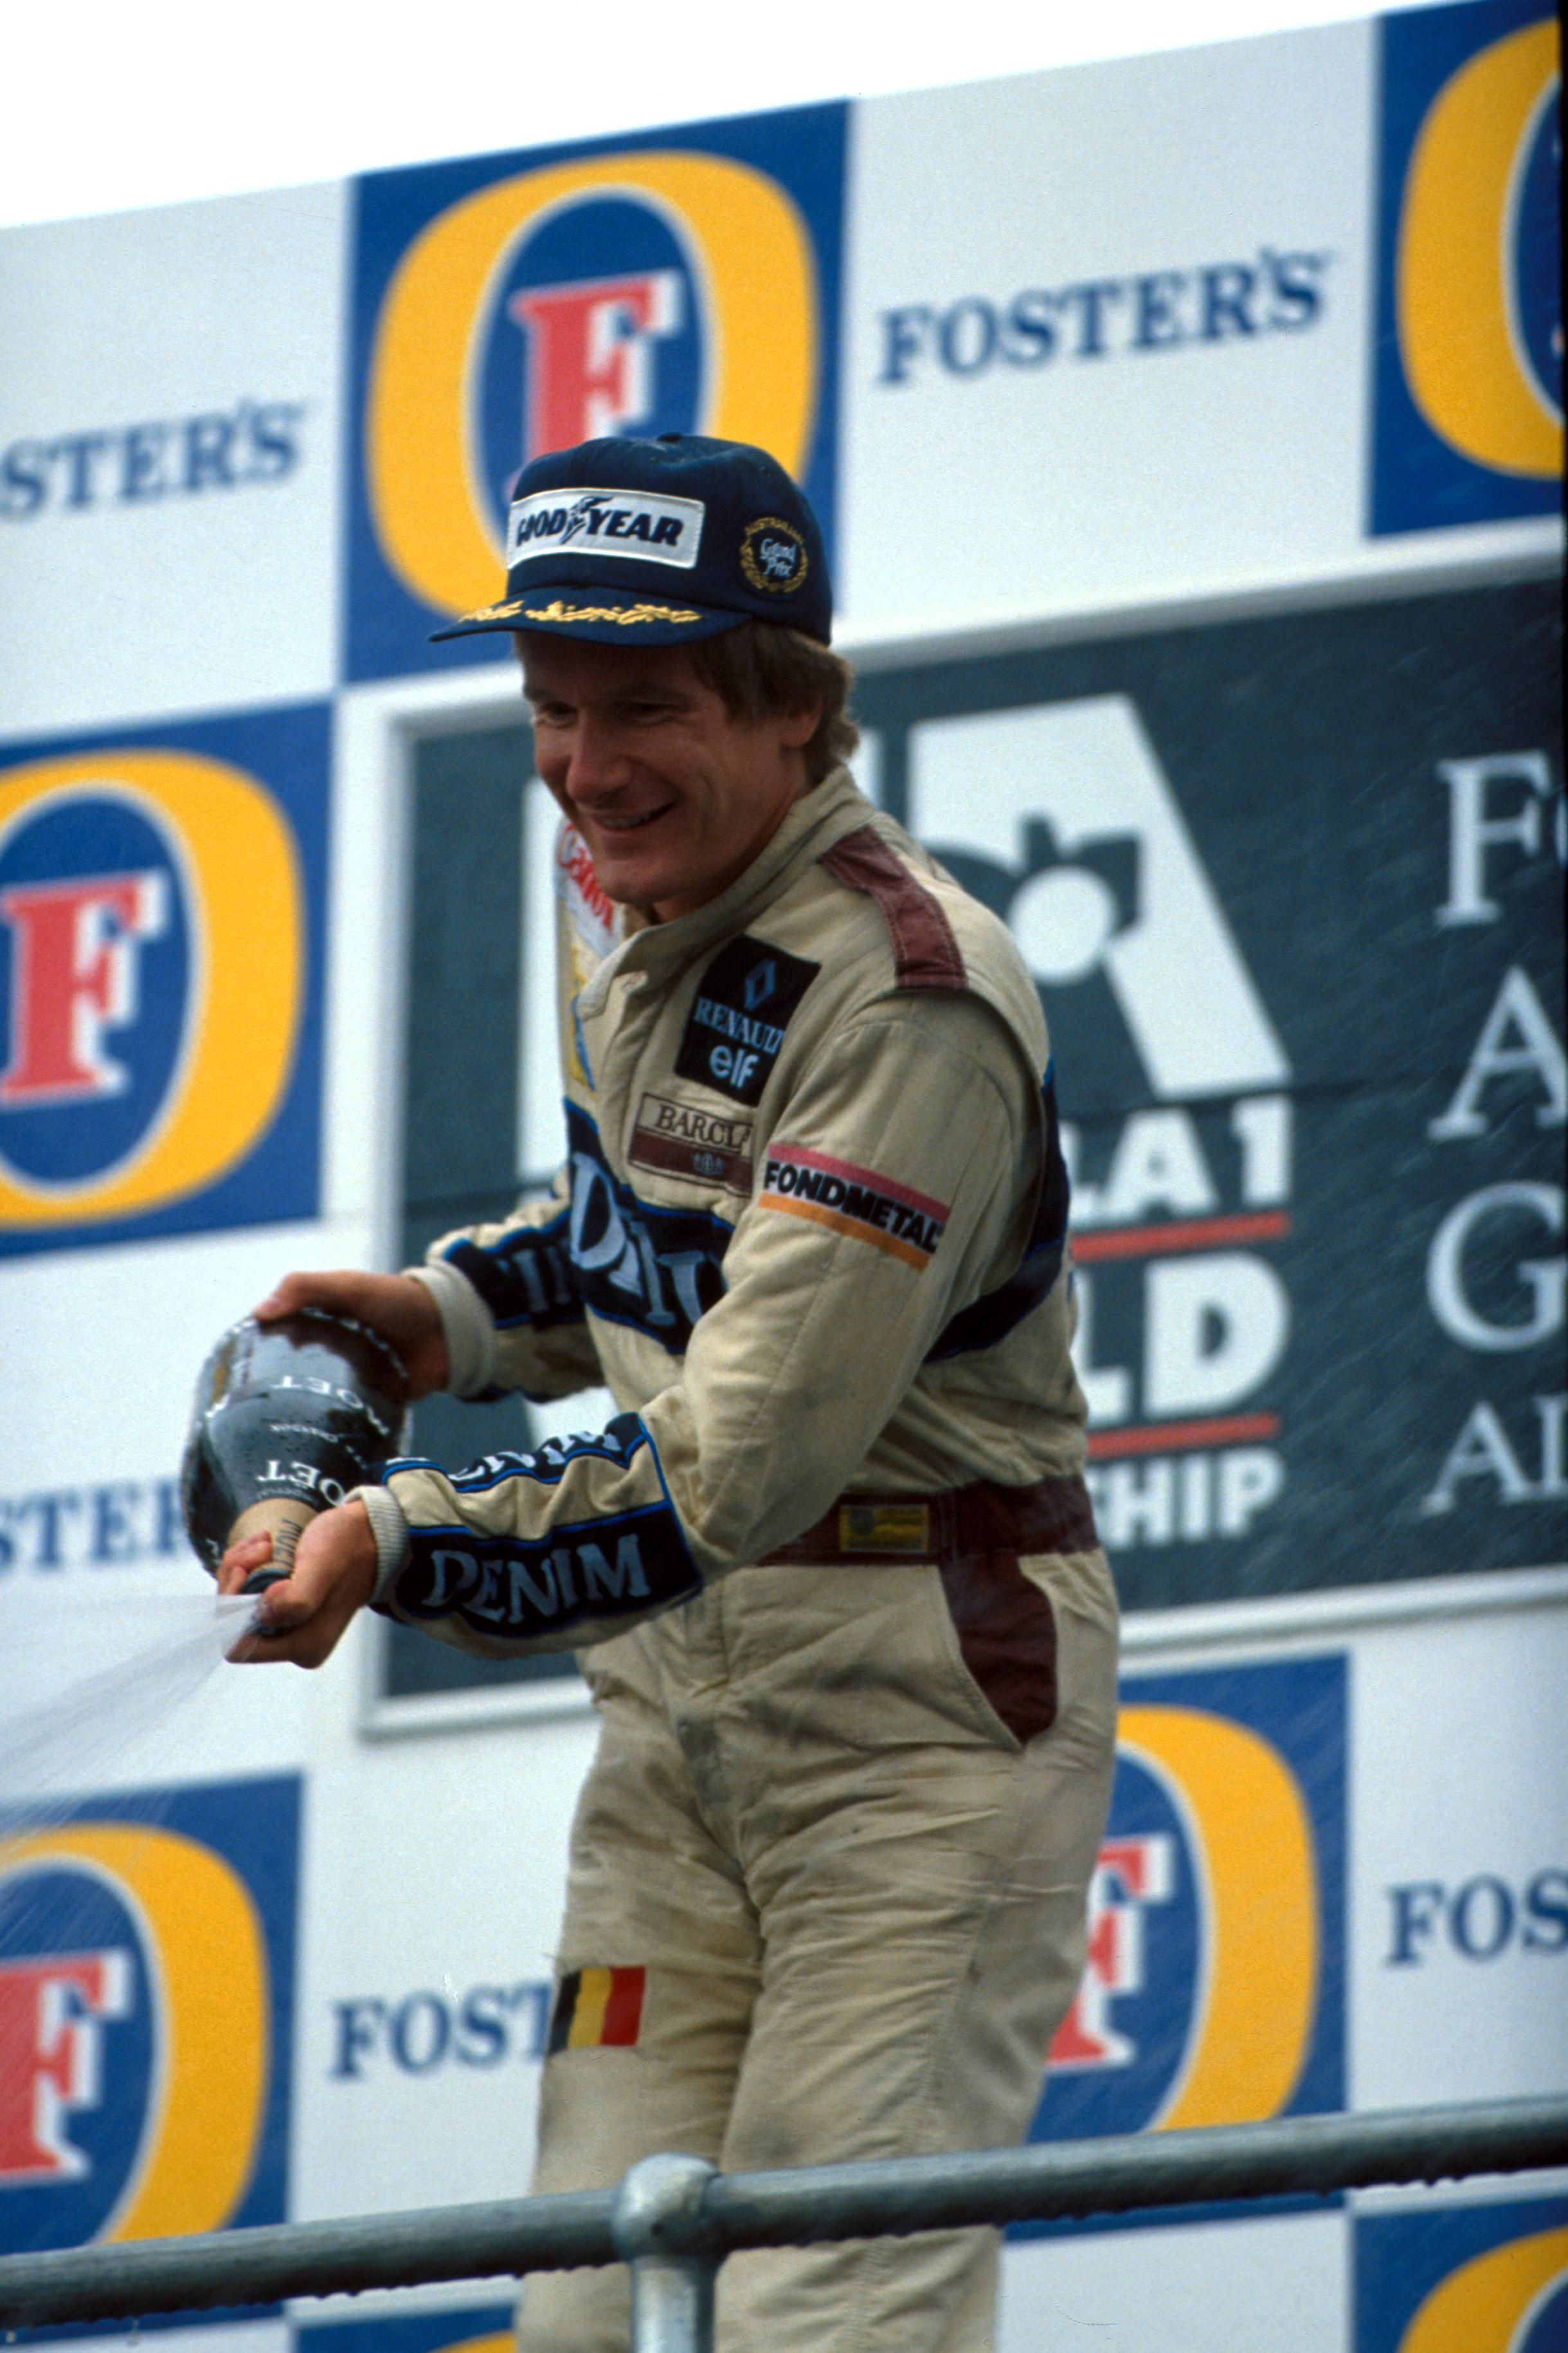 Thierry Boutsen celebrates winning the 1989 Australian GP, his team-mate Riccardo Patrese was 3rd.